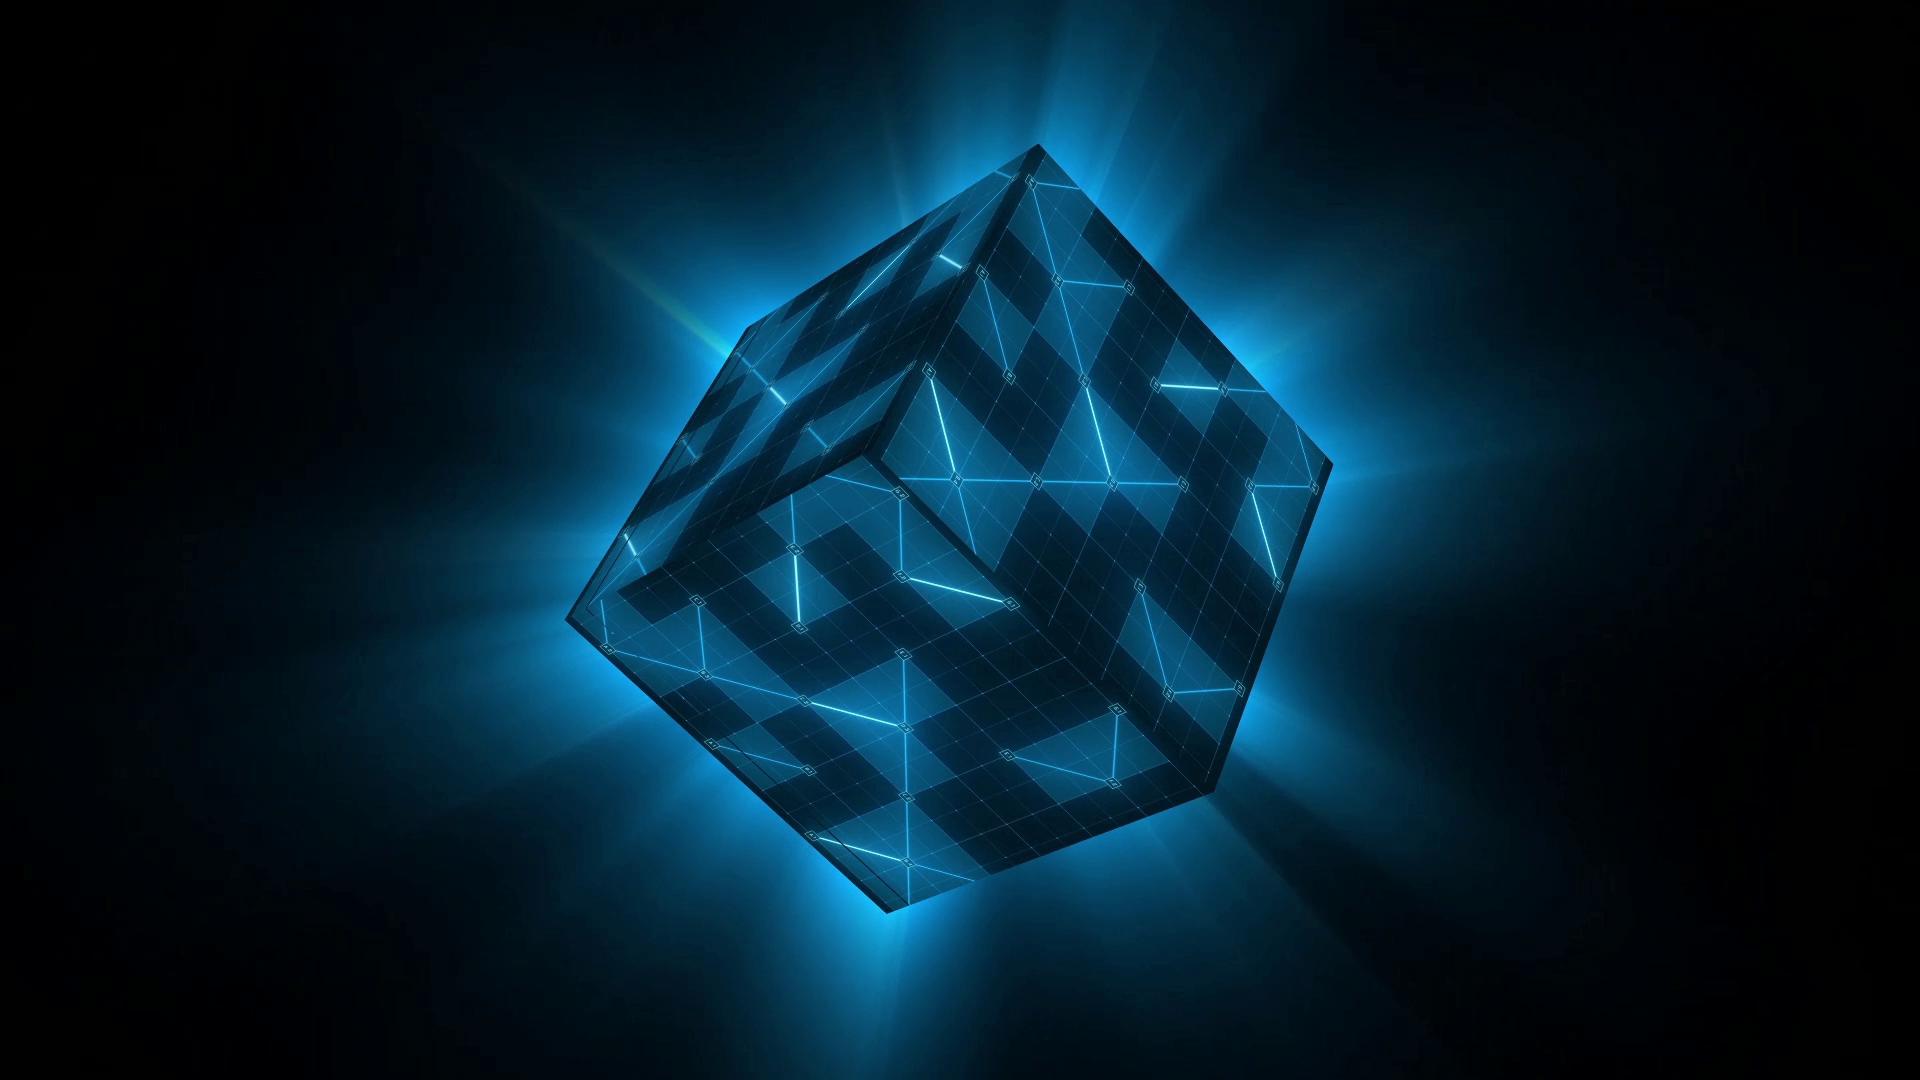 Cube, Abbildung, Geometrie, Umsatz, Halos - Wallpaper HD - Prof.-falken.com